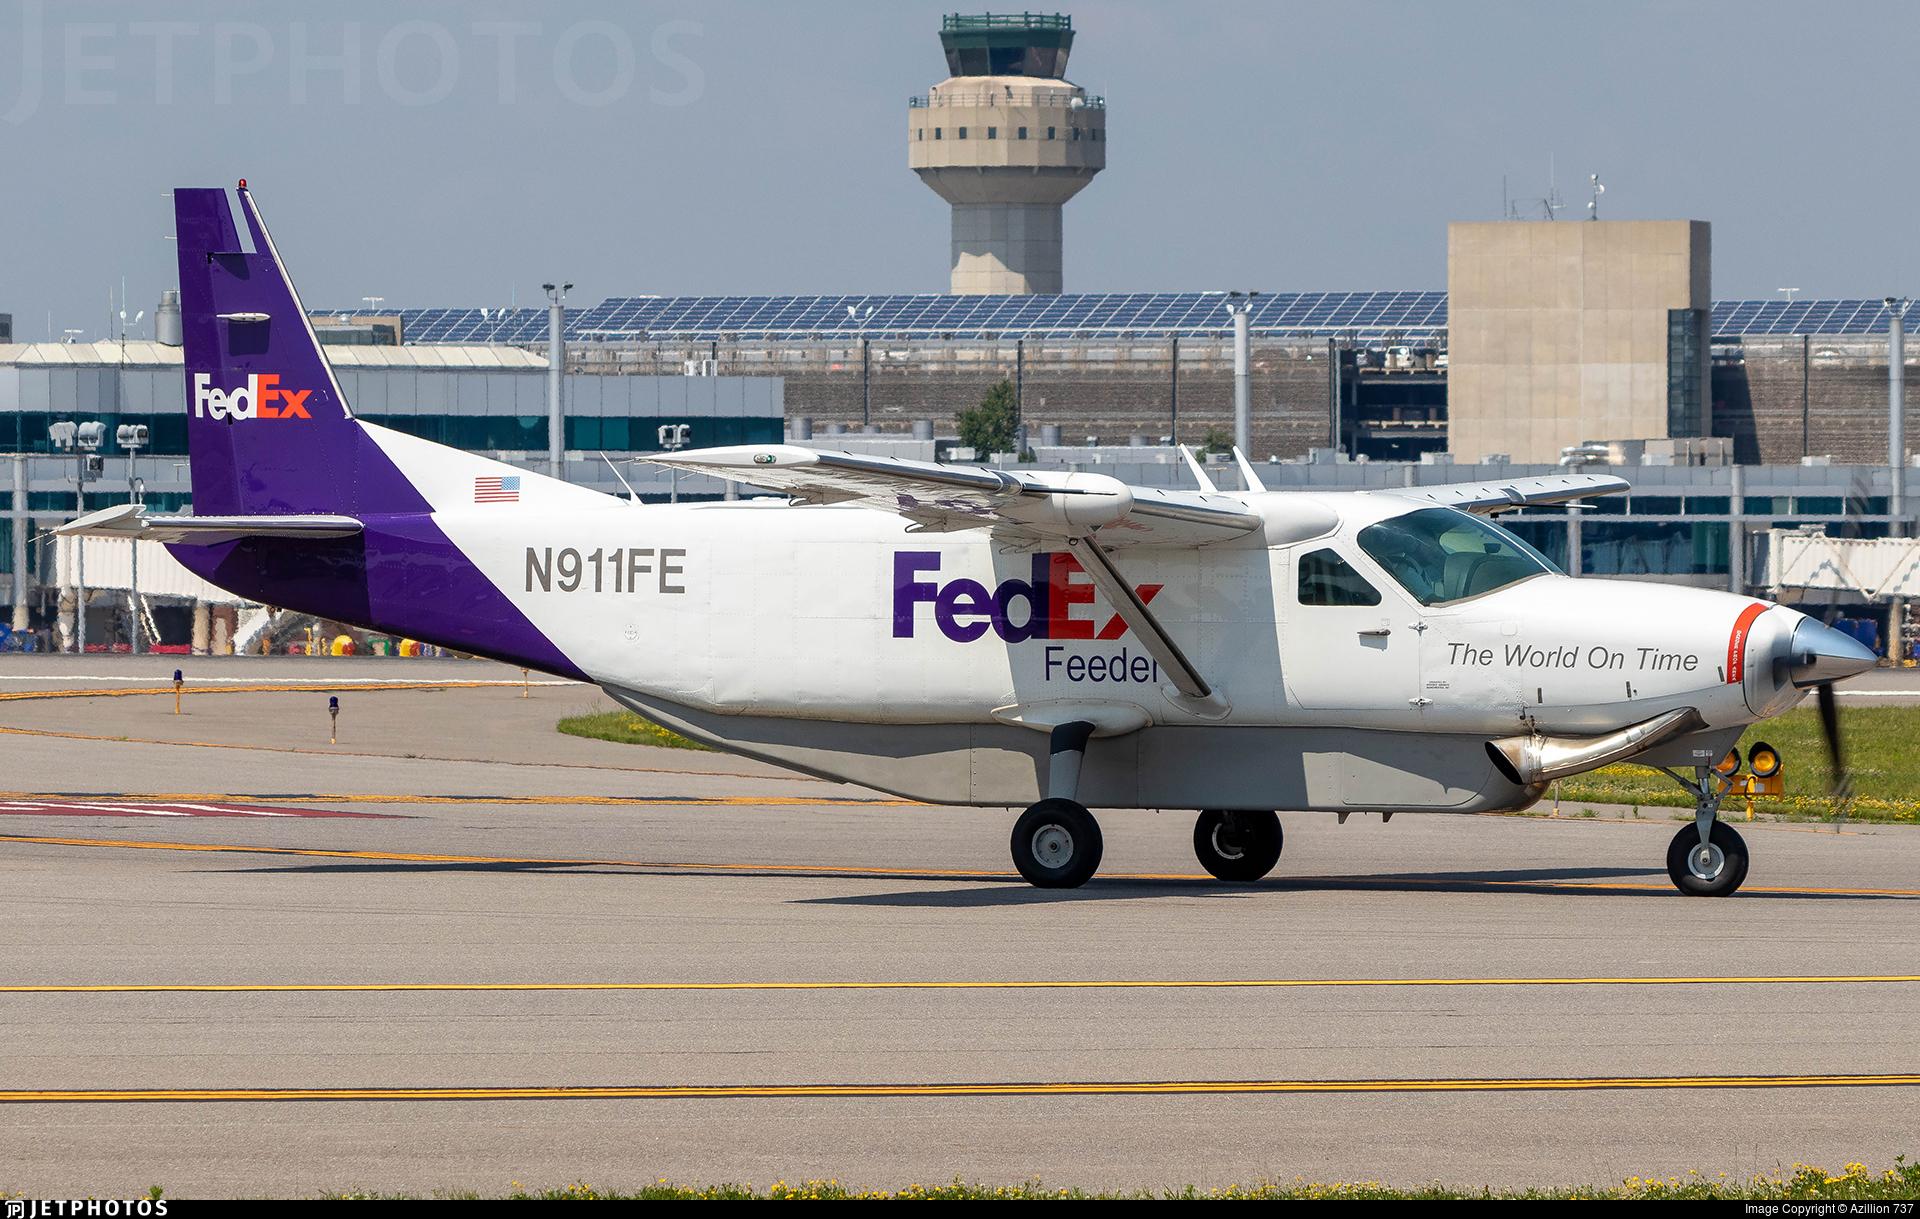 N911FE - Cessna 208B Super Cargomaster - FedEx Feeder (Wiggins Airways)